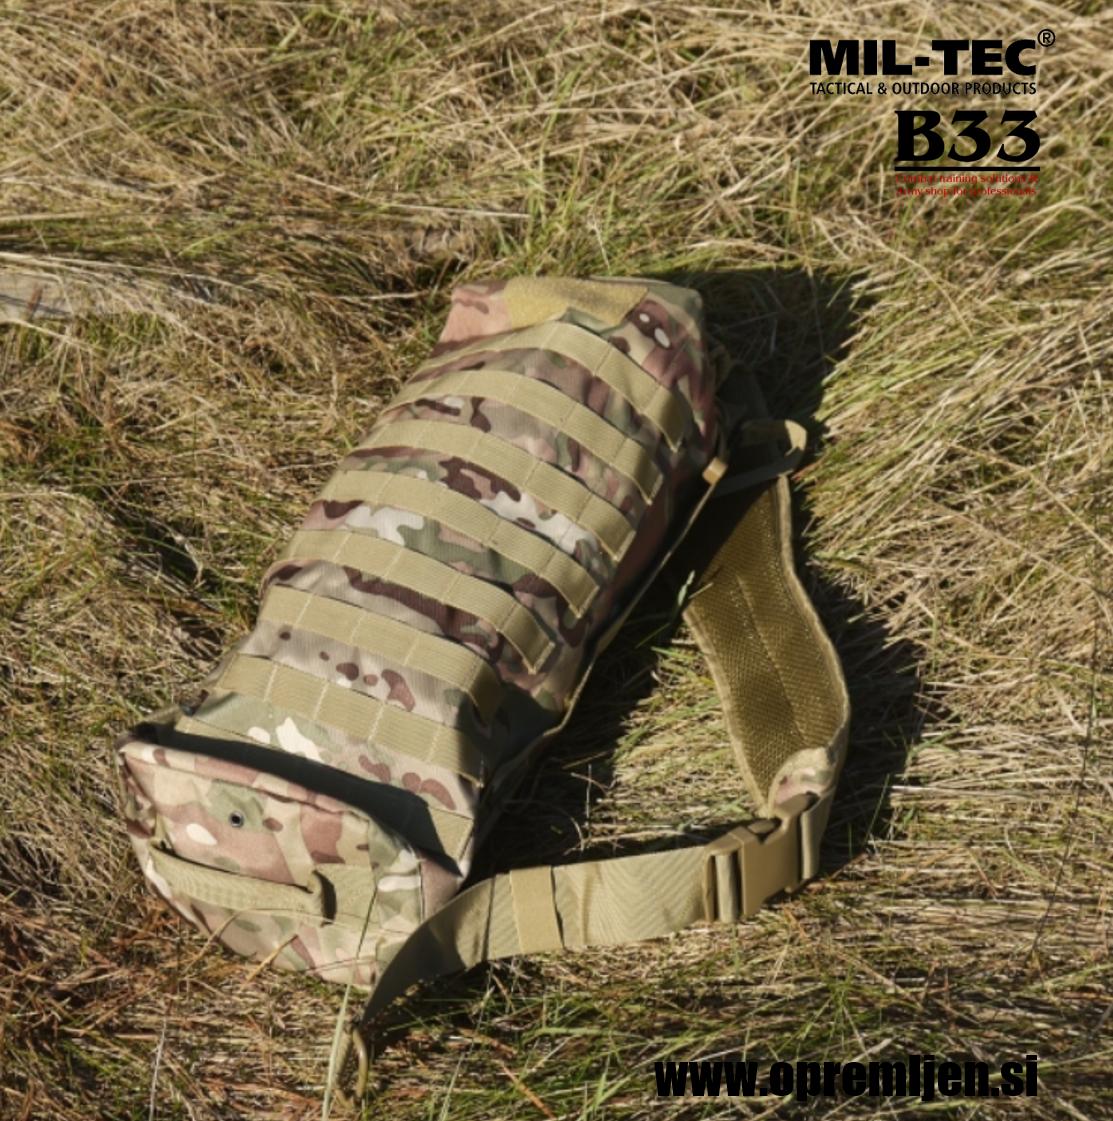 B33 army shop - vojaške ramenska torba MOLLE, MILTEC, MILTEC by B33 army shop at www.opremljen.si (vojaška trgovina, trgovina z vojaško opremo)